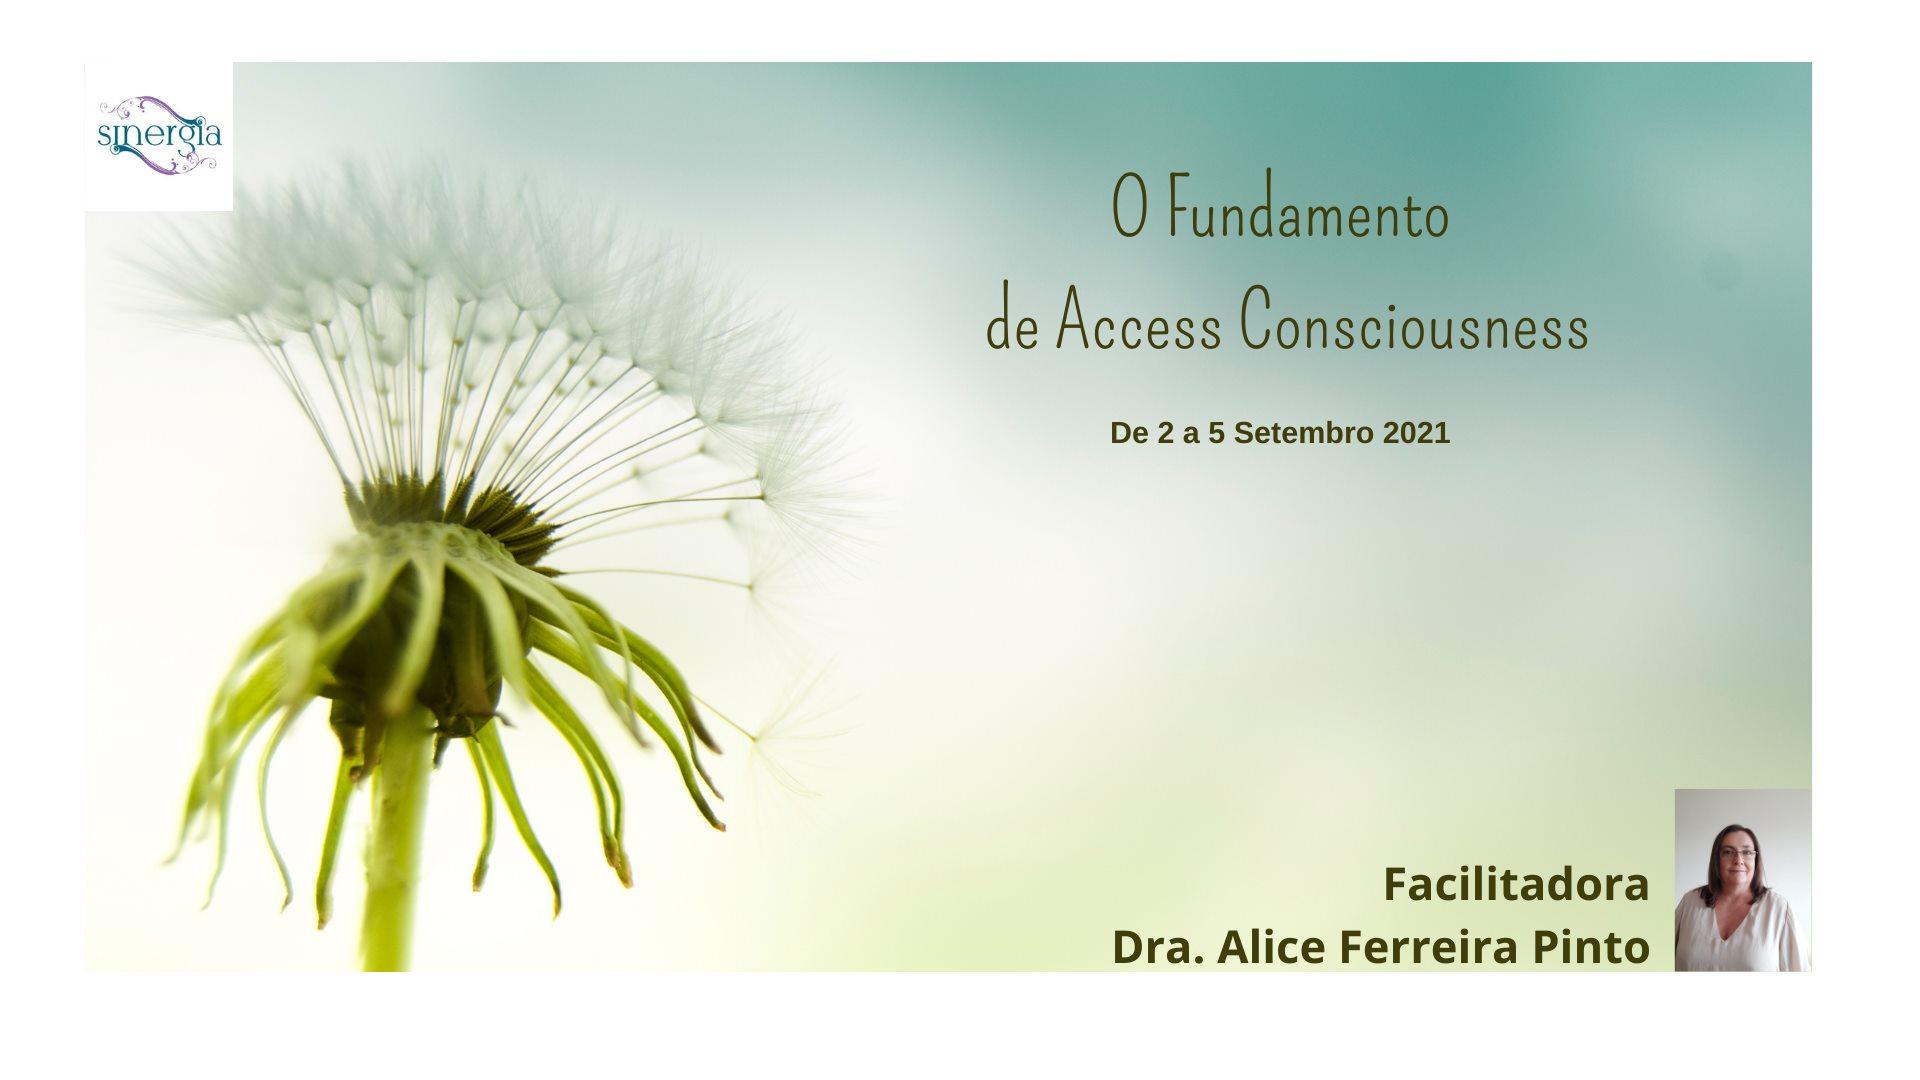 O Fundamento de Access Consciousness